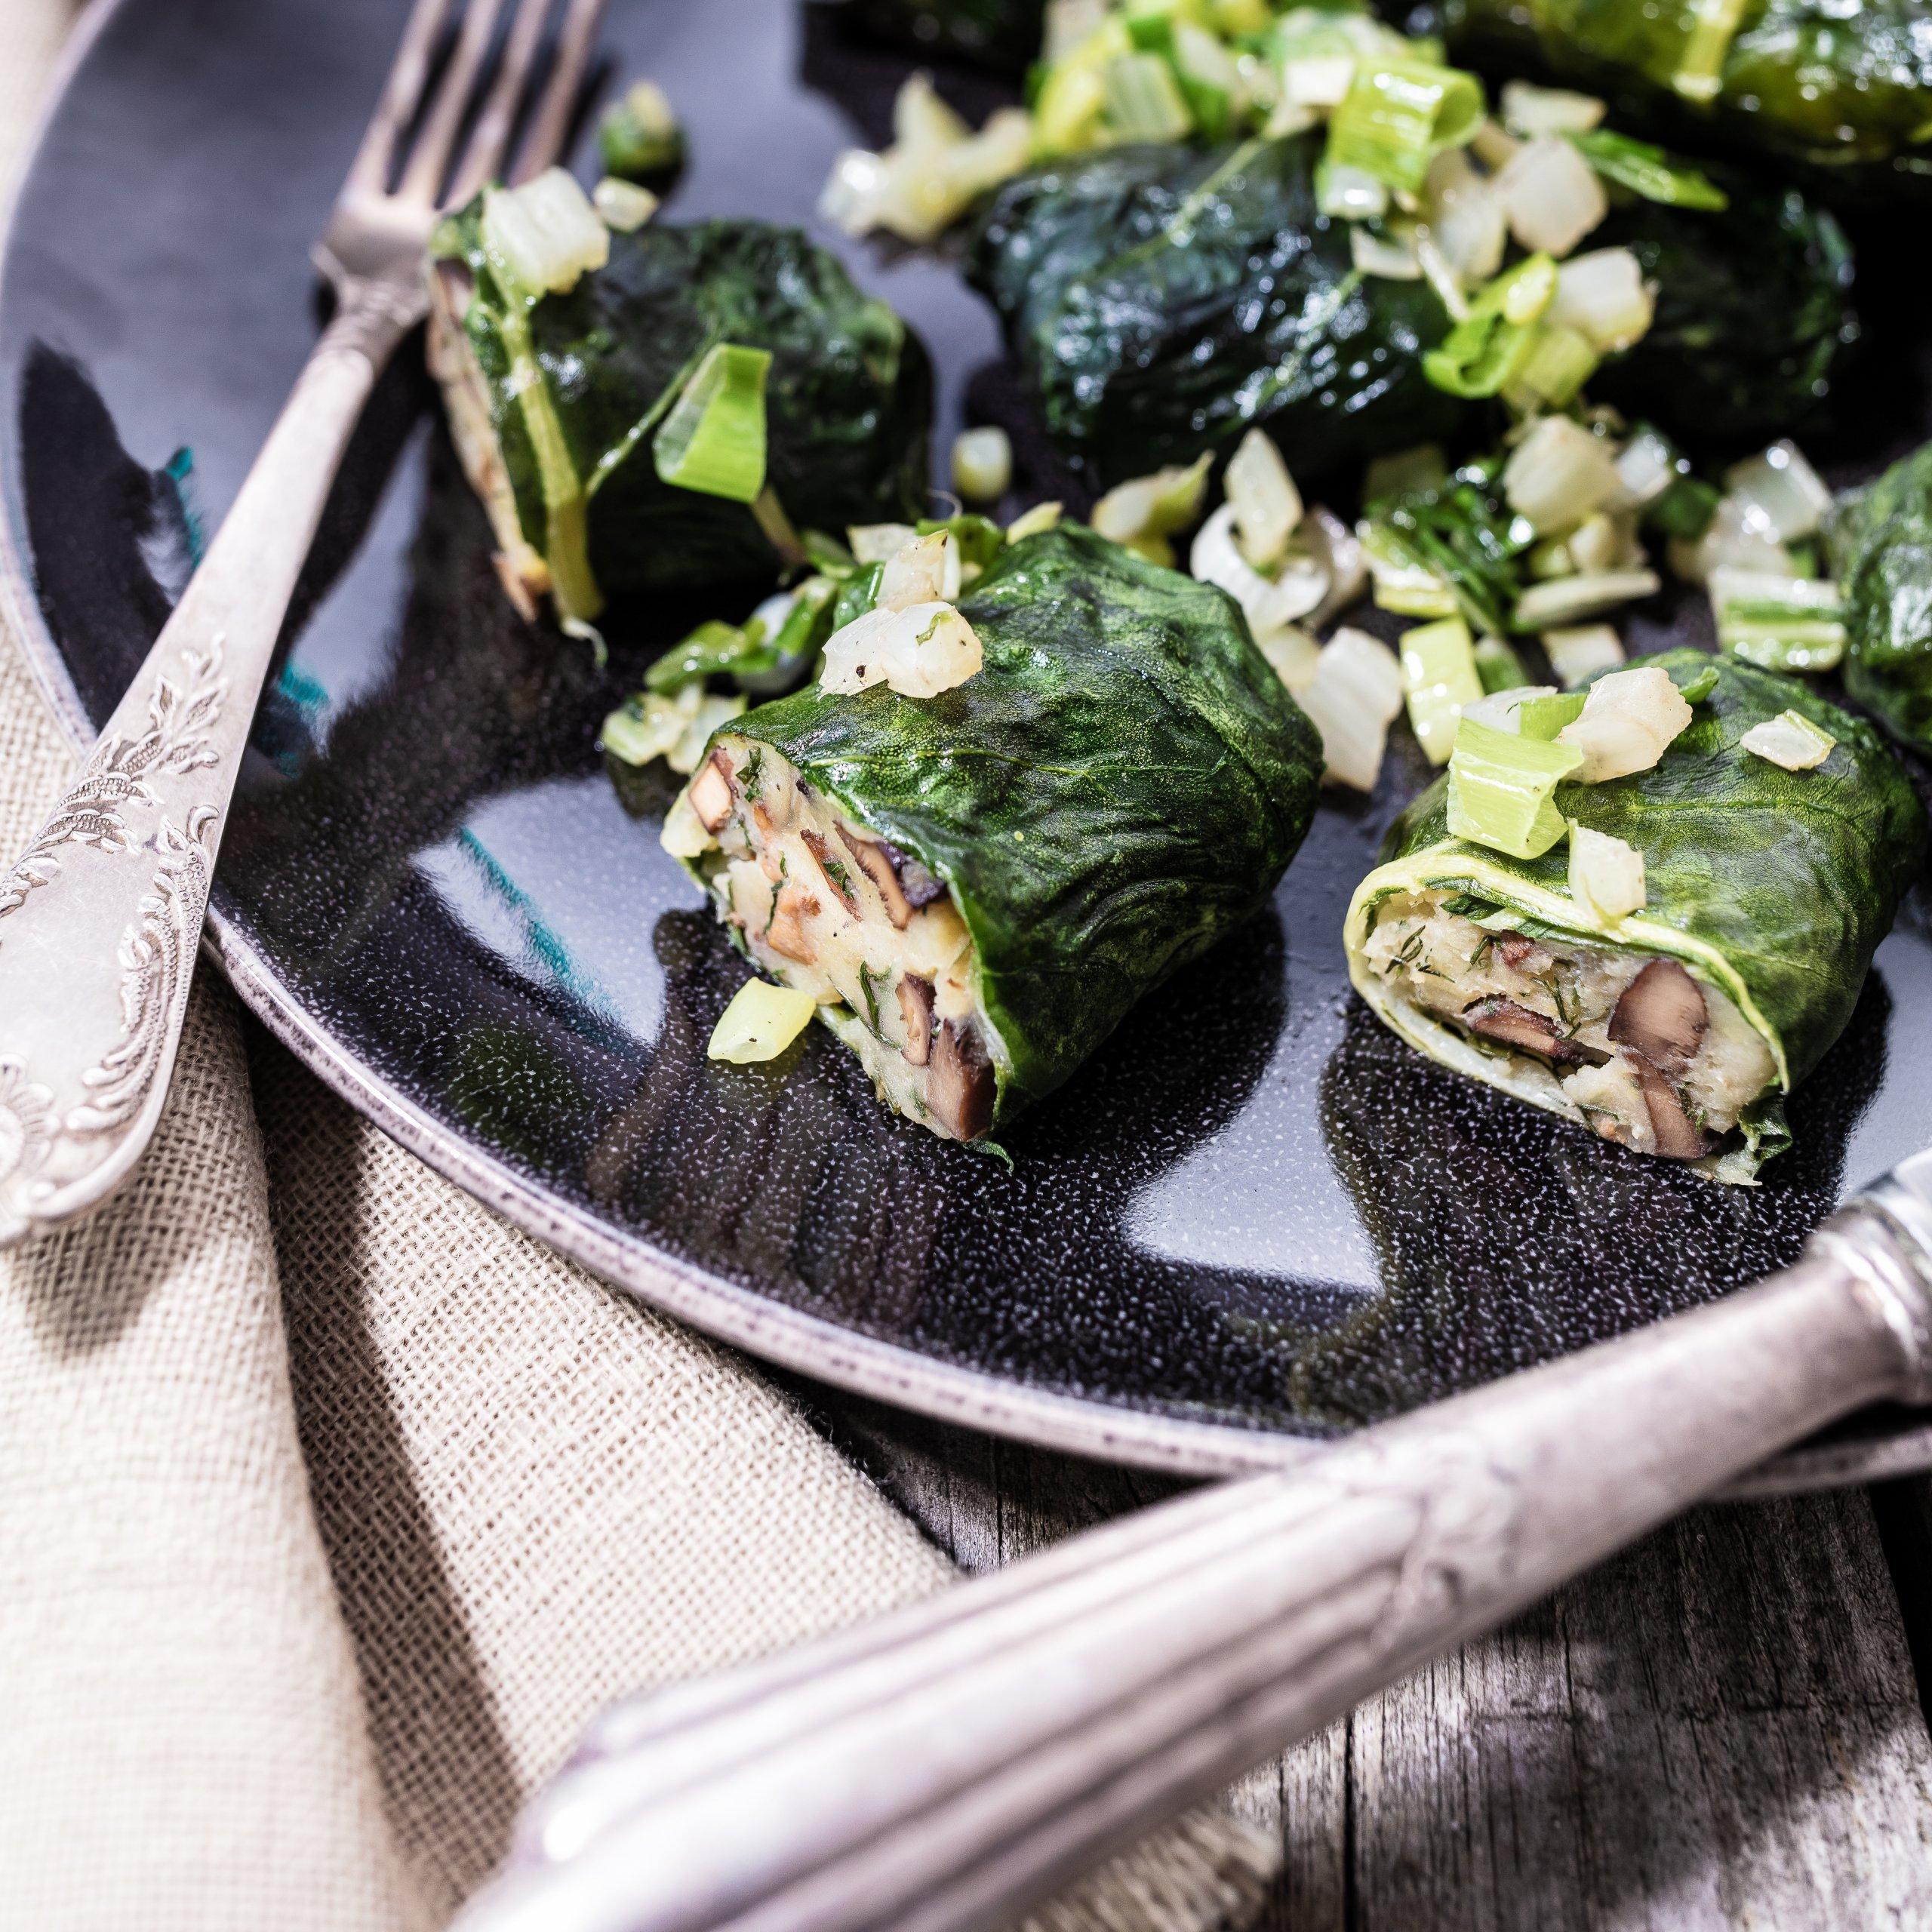 Vegan Chard Wraps With Mushroom And Potato Filling